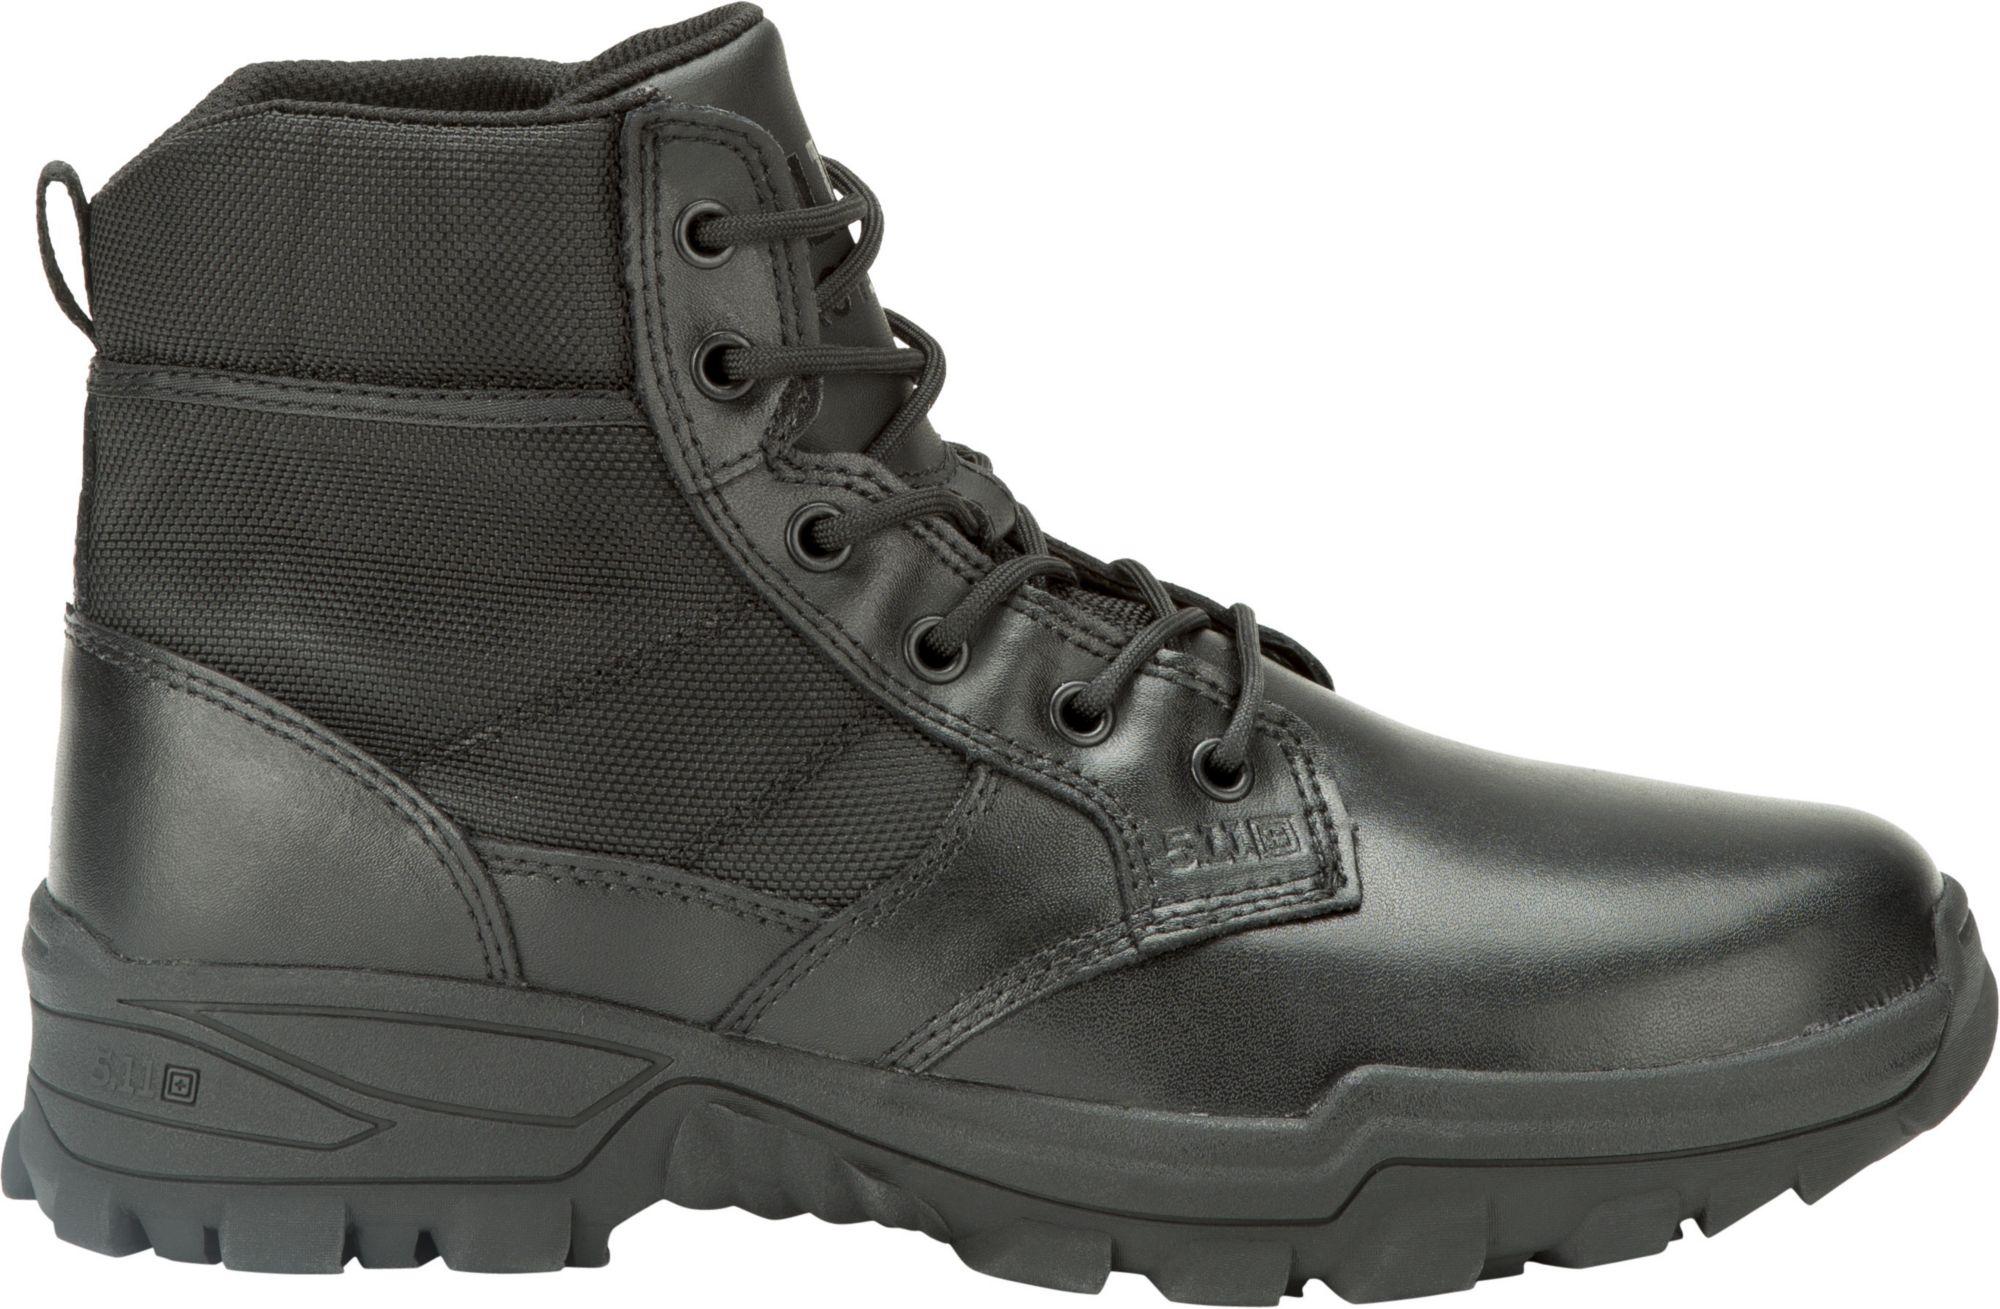 5.11 Tactical Men's Speed 3.0 Tactical Boots, Black thumbnail